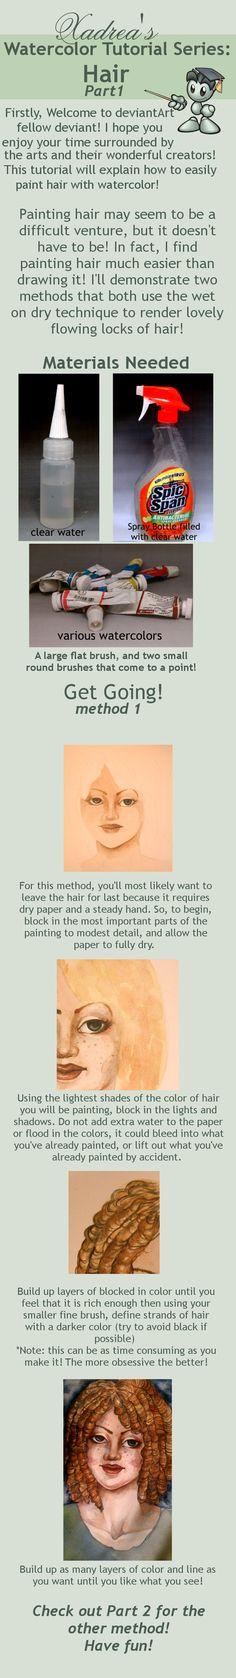 Watercolor Tutorial: Hair part 1 by =Xadrea on deviantART